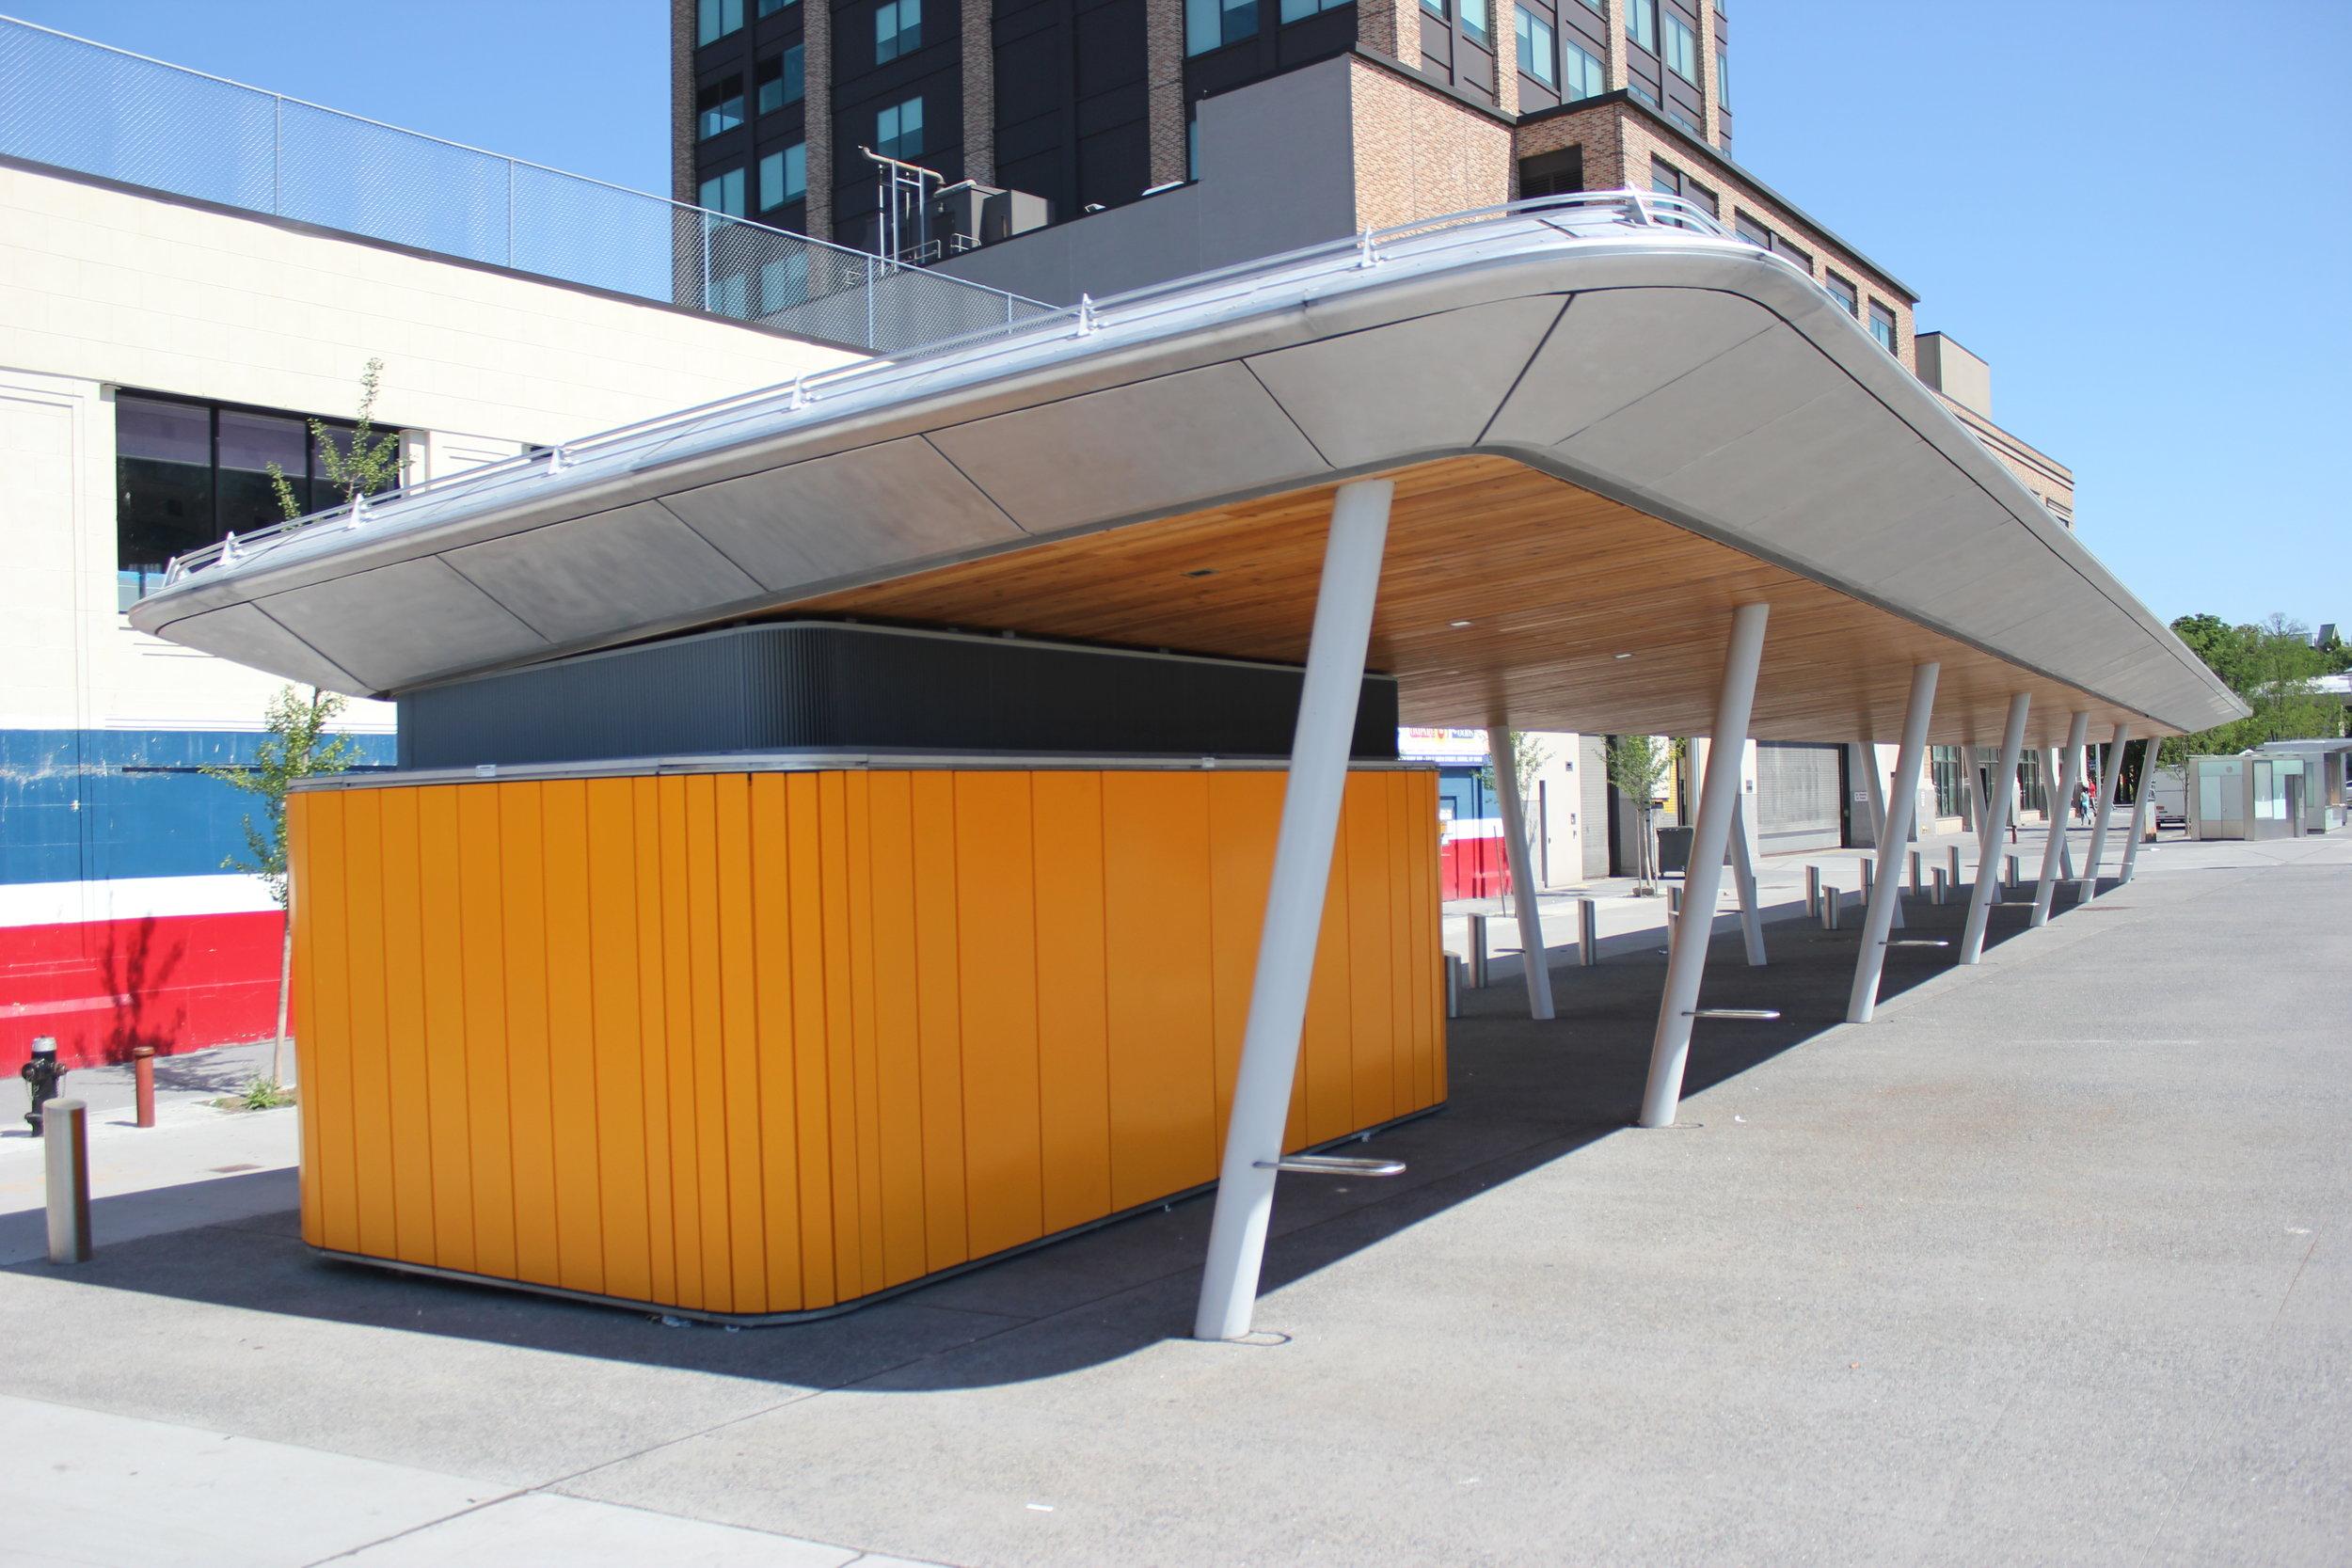 Farmer's Market Canopy and Storage